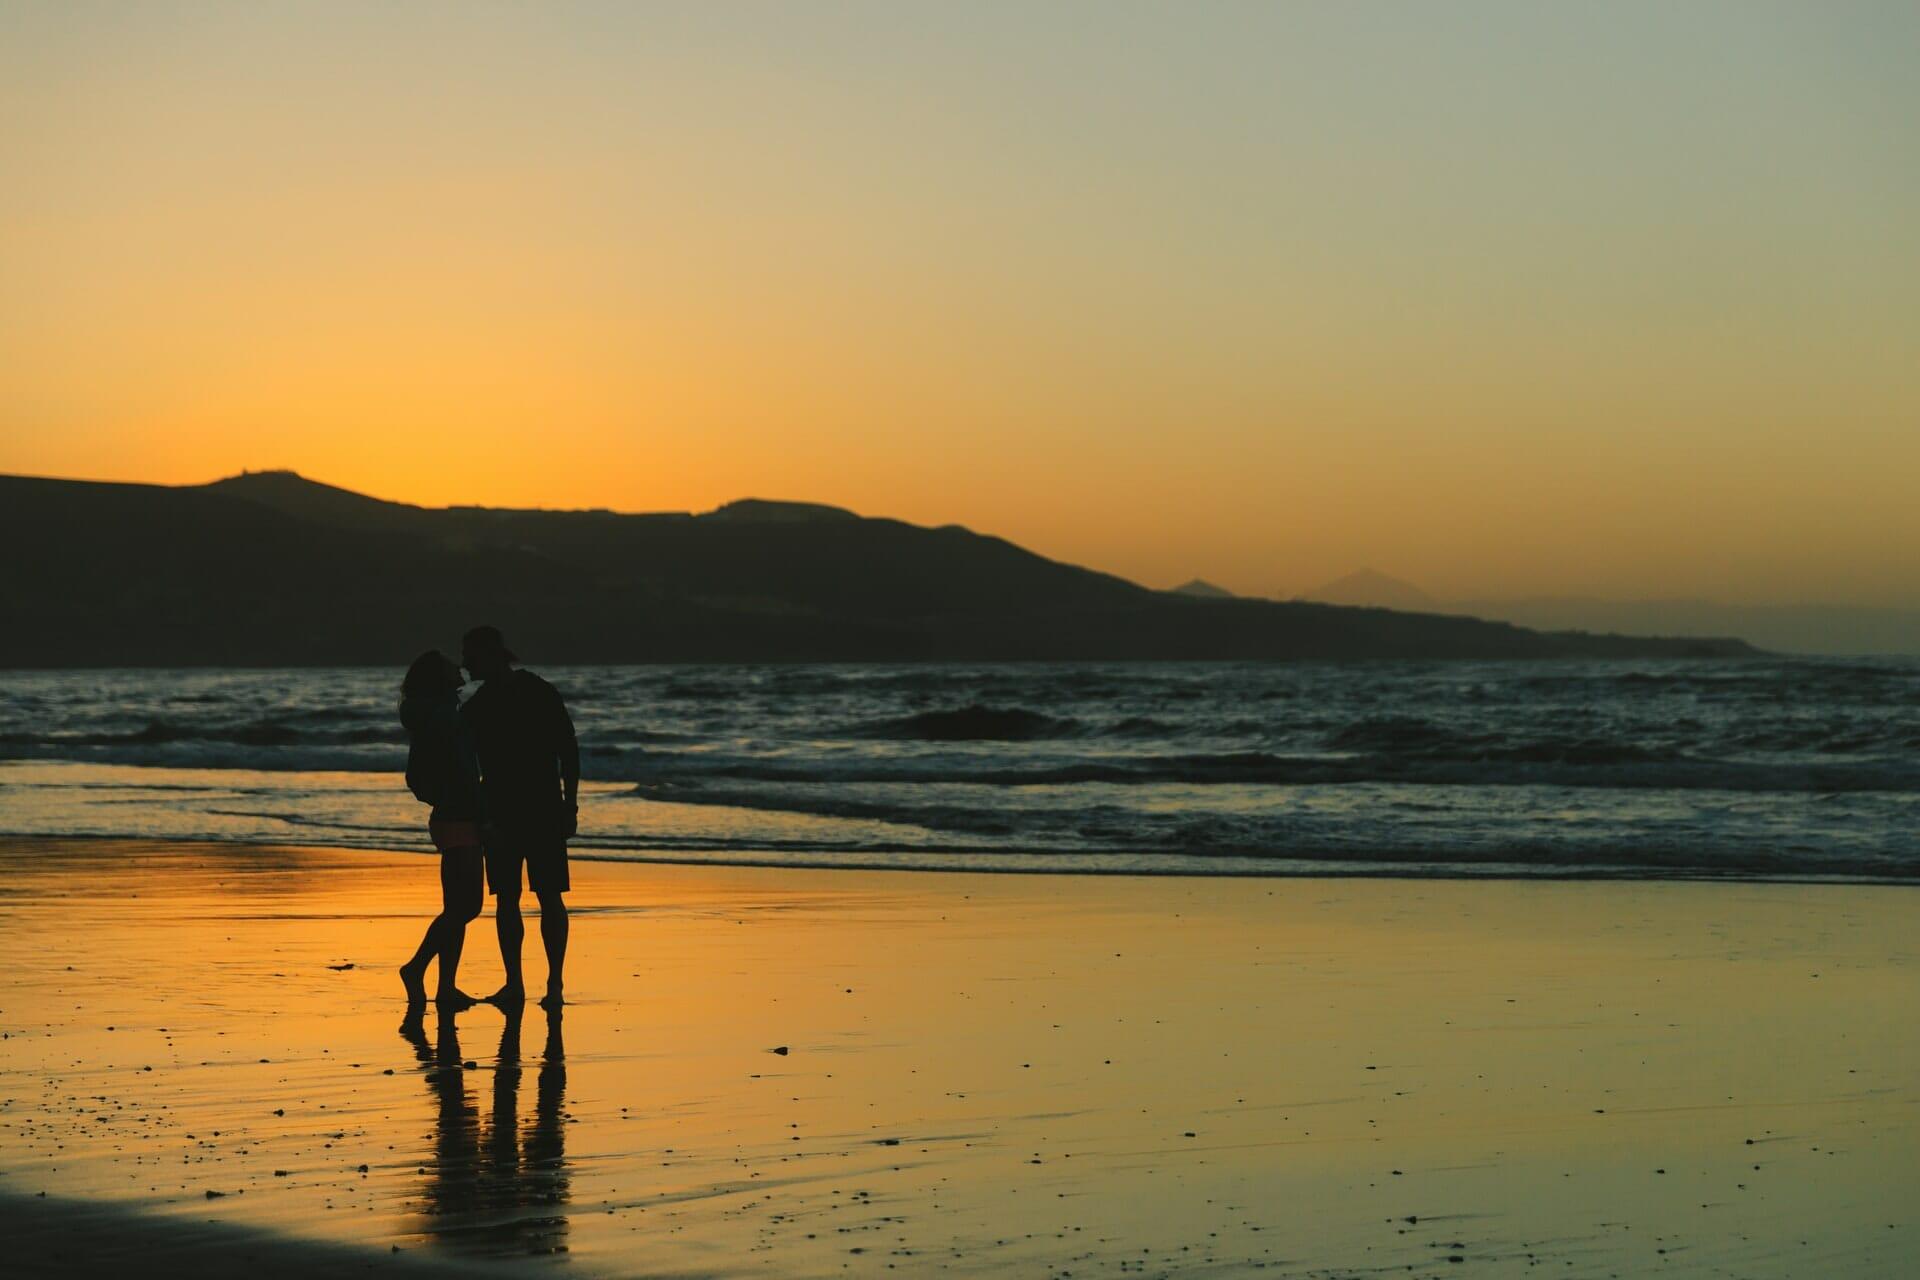 Bucket List Couple - Balade sur la plage